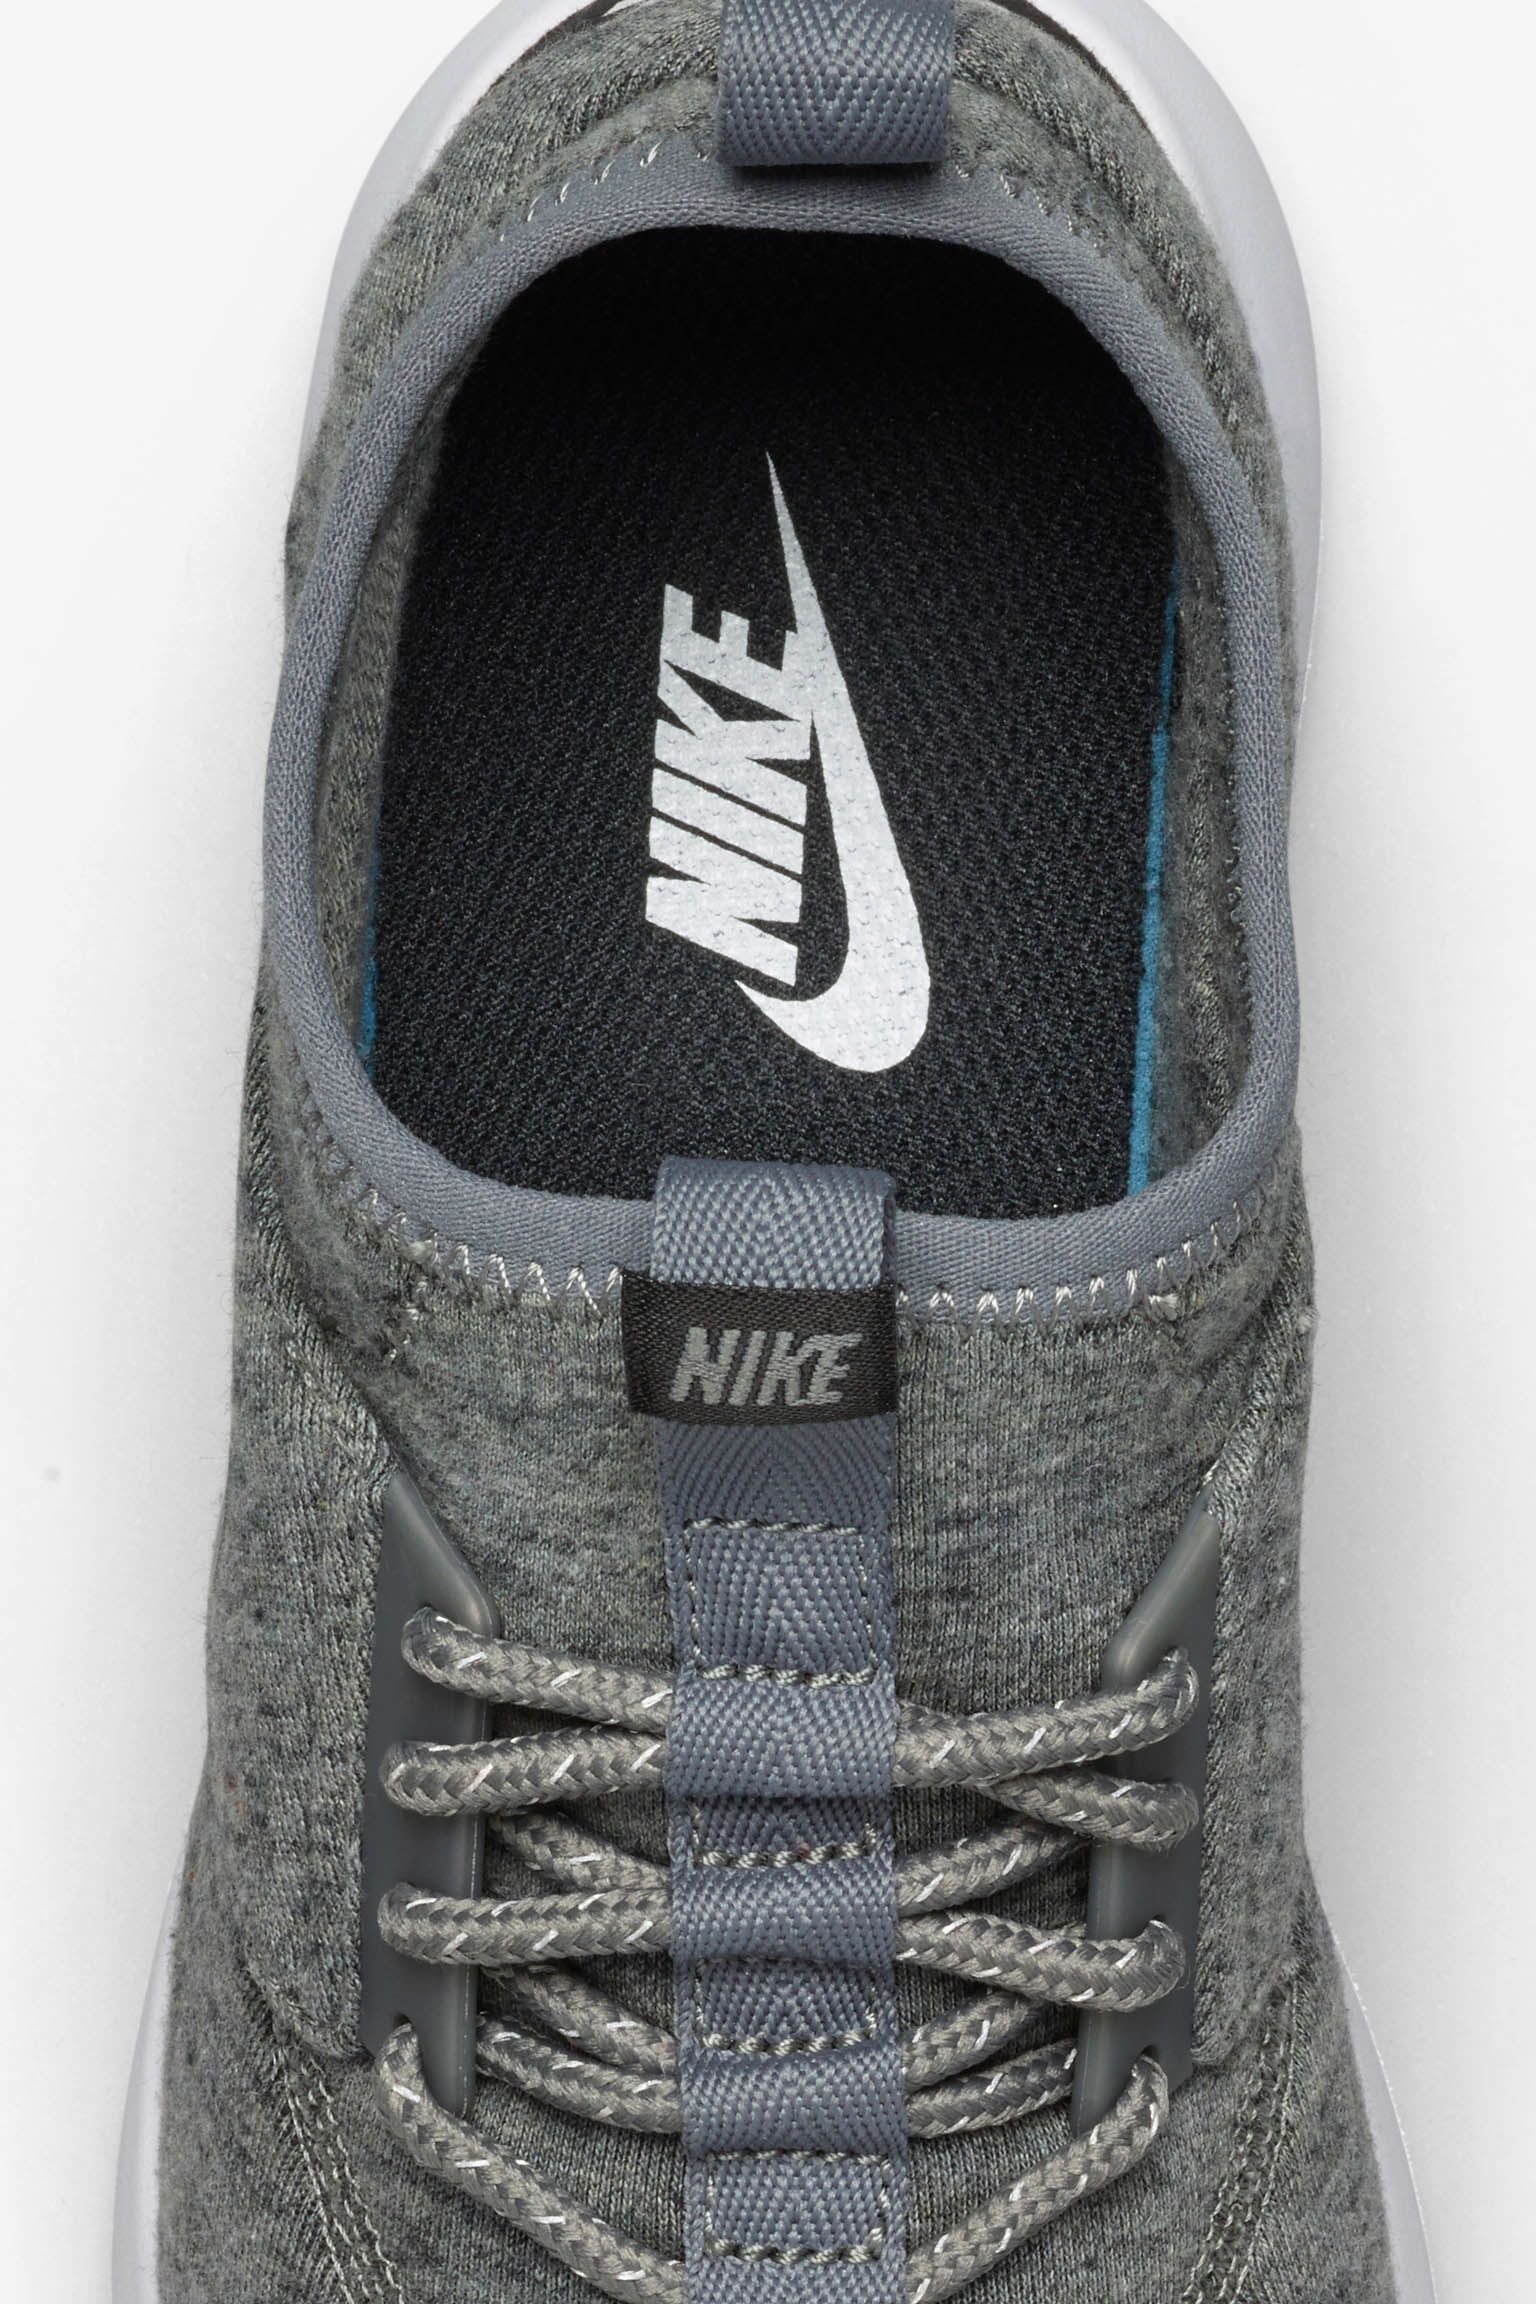 Nike Air Huarache 'Tech Fleece' Black & Grey